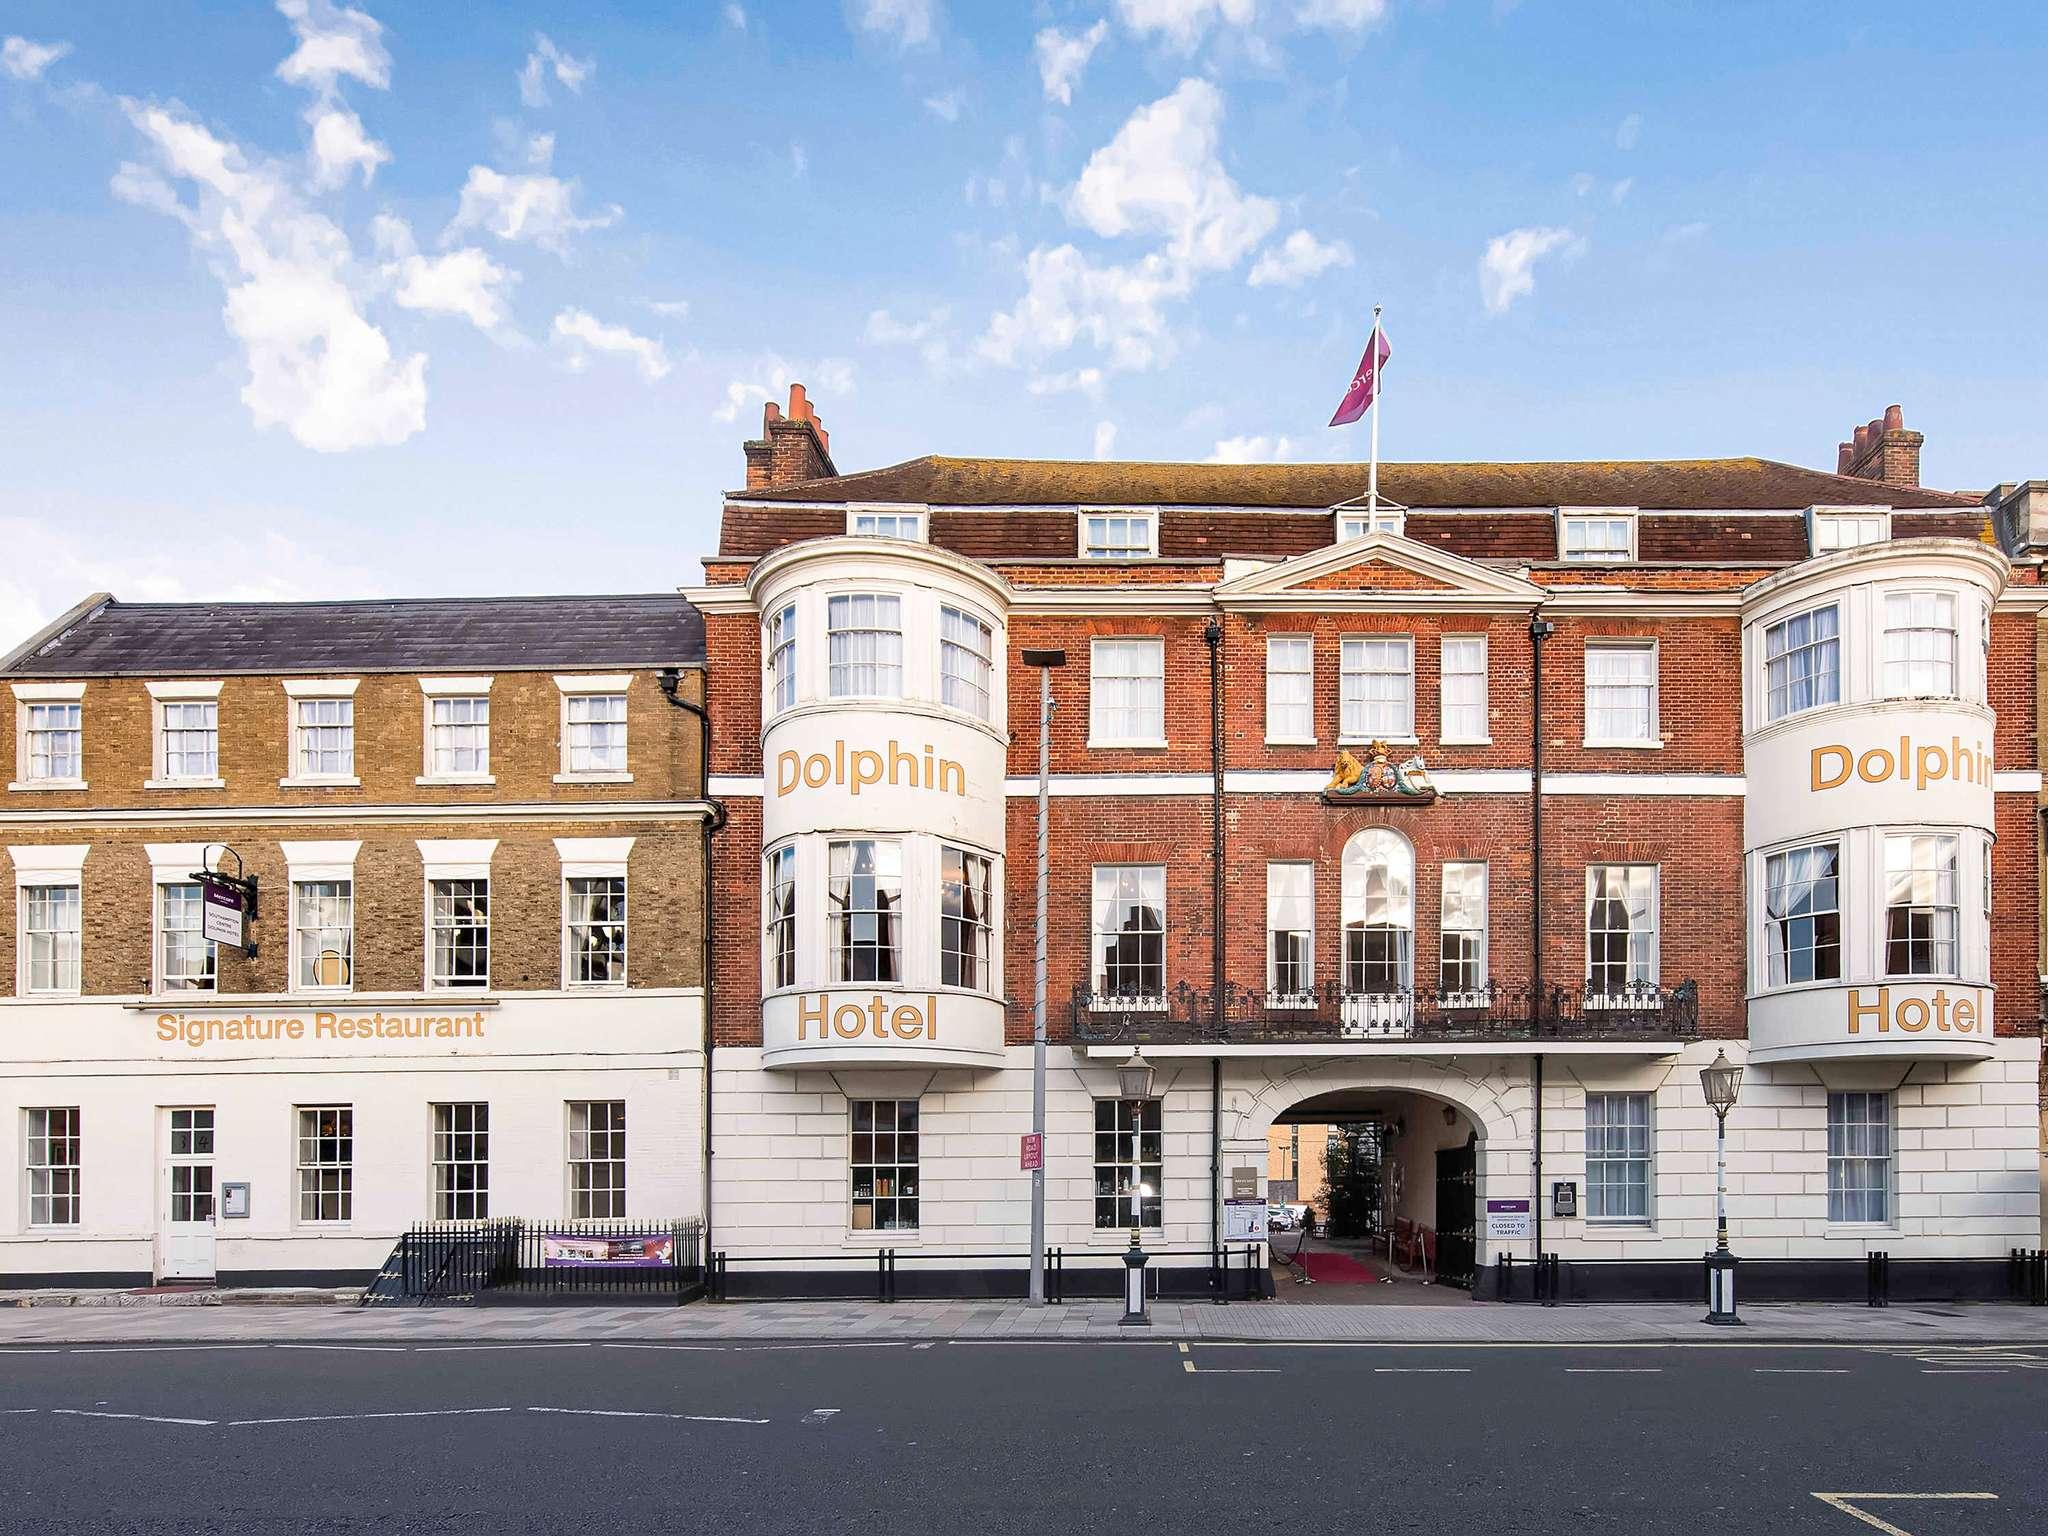 Hotel – Mercure Southampton Centre Dolphin Hotel